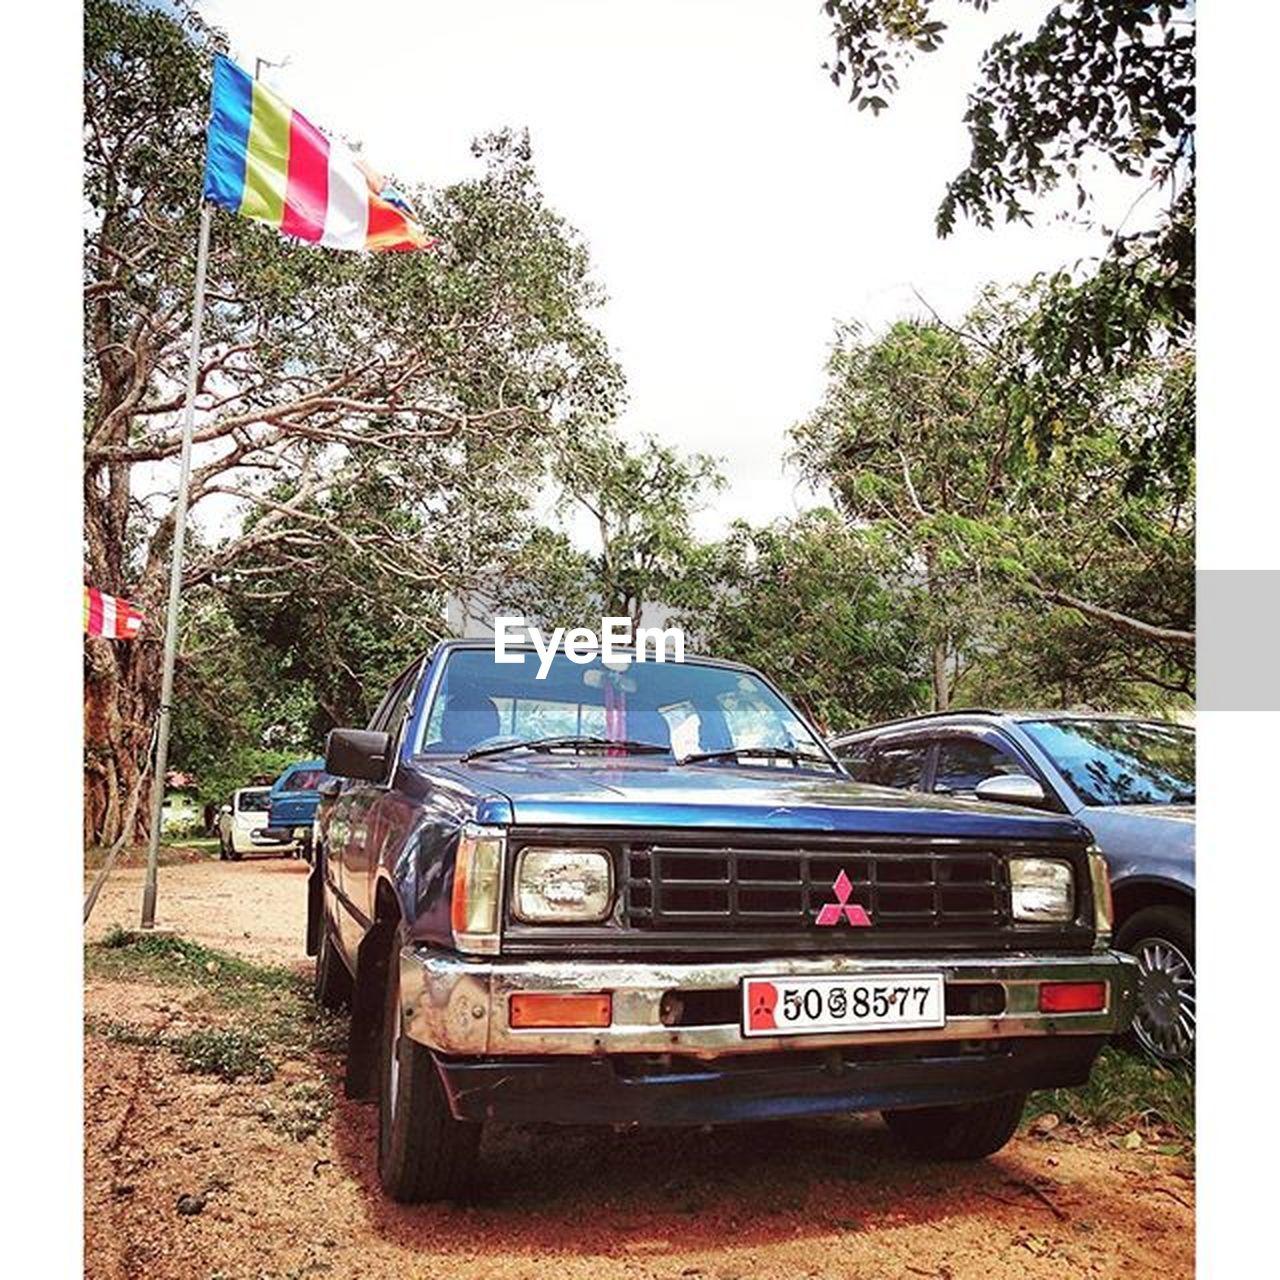 flag, car, tree, day, transportation, land vehicle, patriotism, outdoors, no people, sky